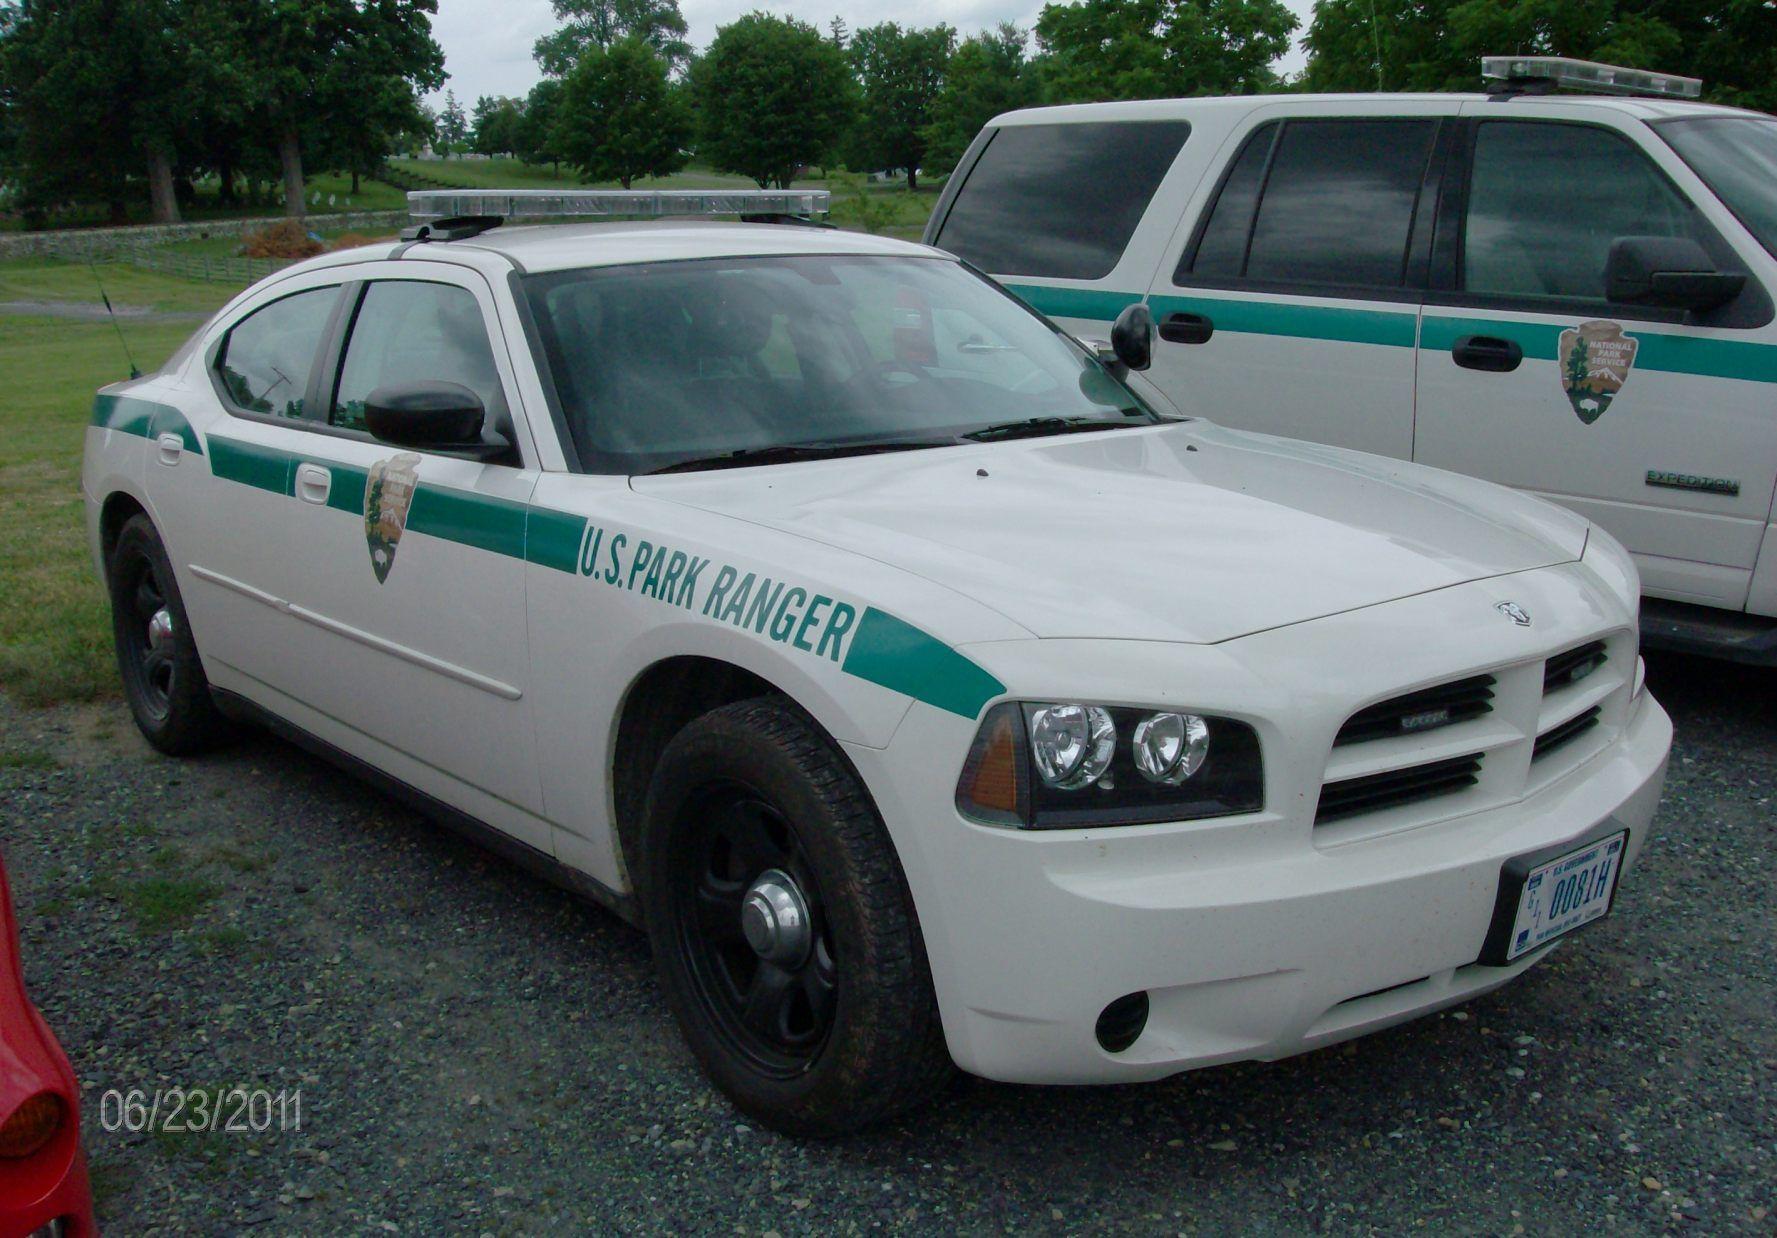 National Park Service Gettysburg Law Enforcement Ranger Police Cars Emergency Vehicles Law Enforcement